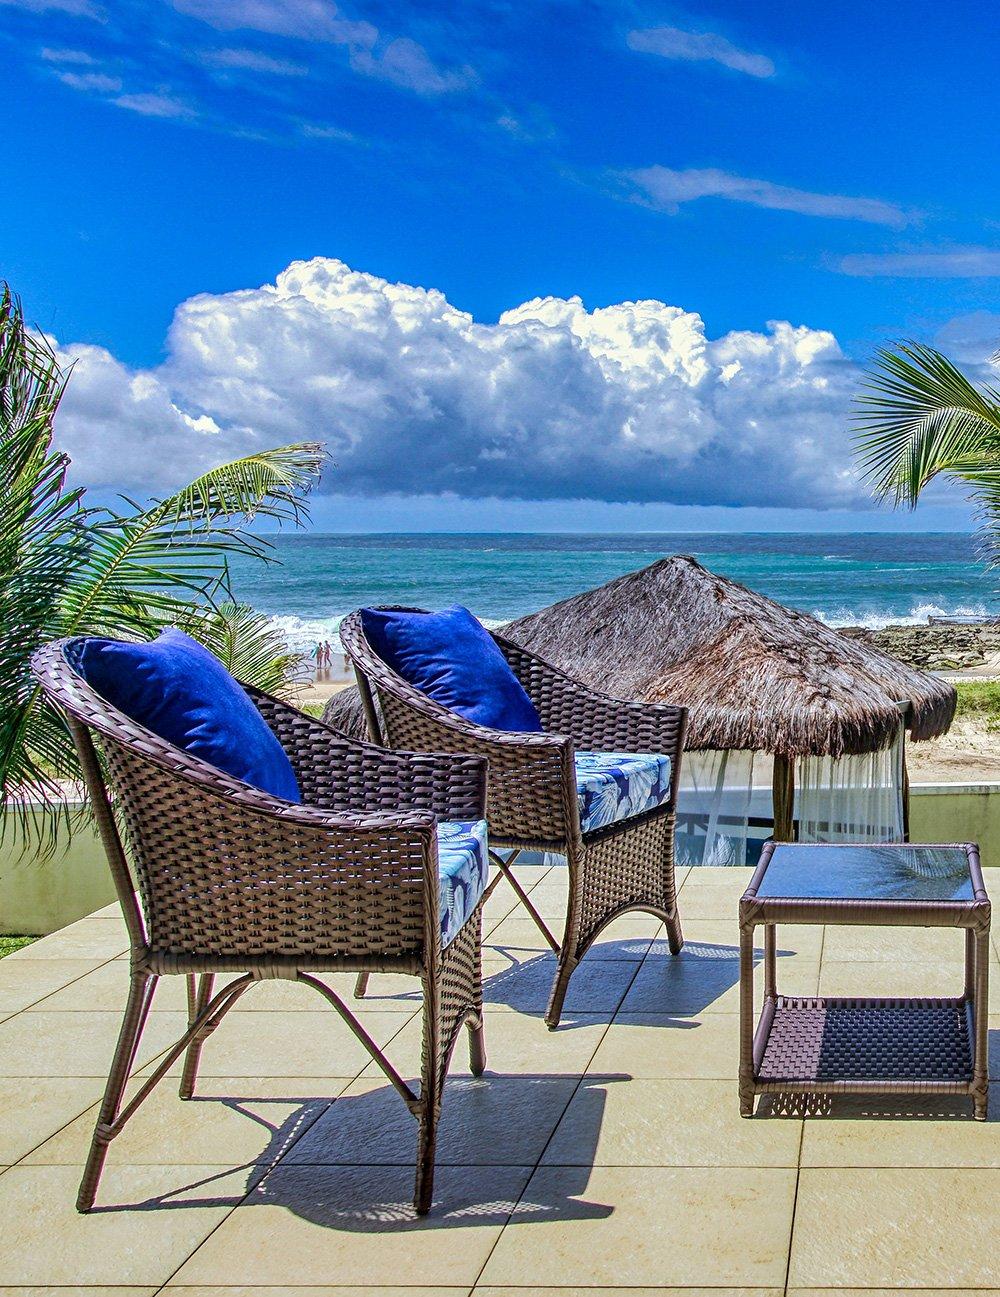 Casa-de-praia-para-alugar_vistaSurpreendente